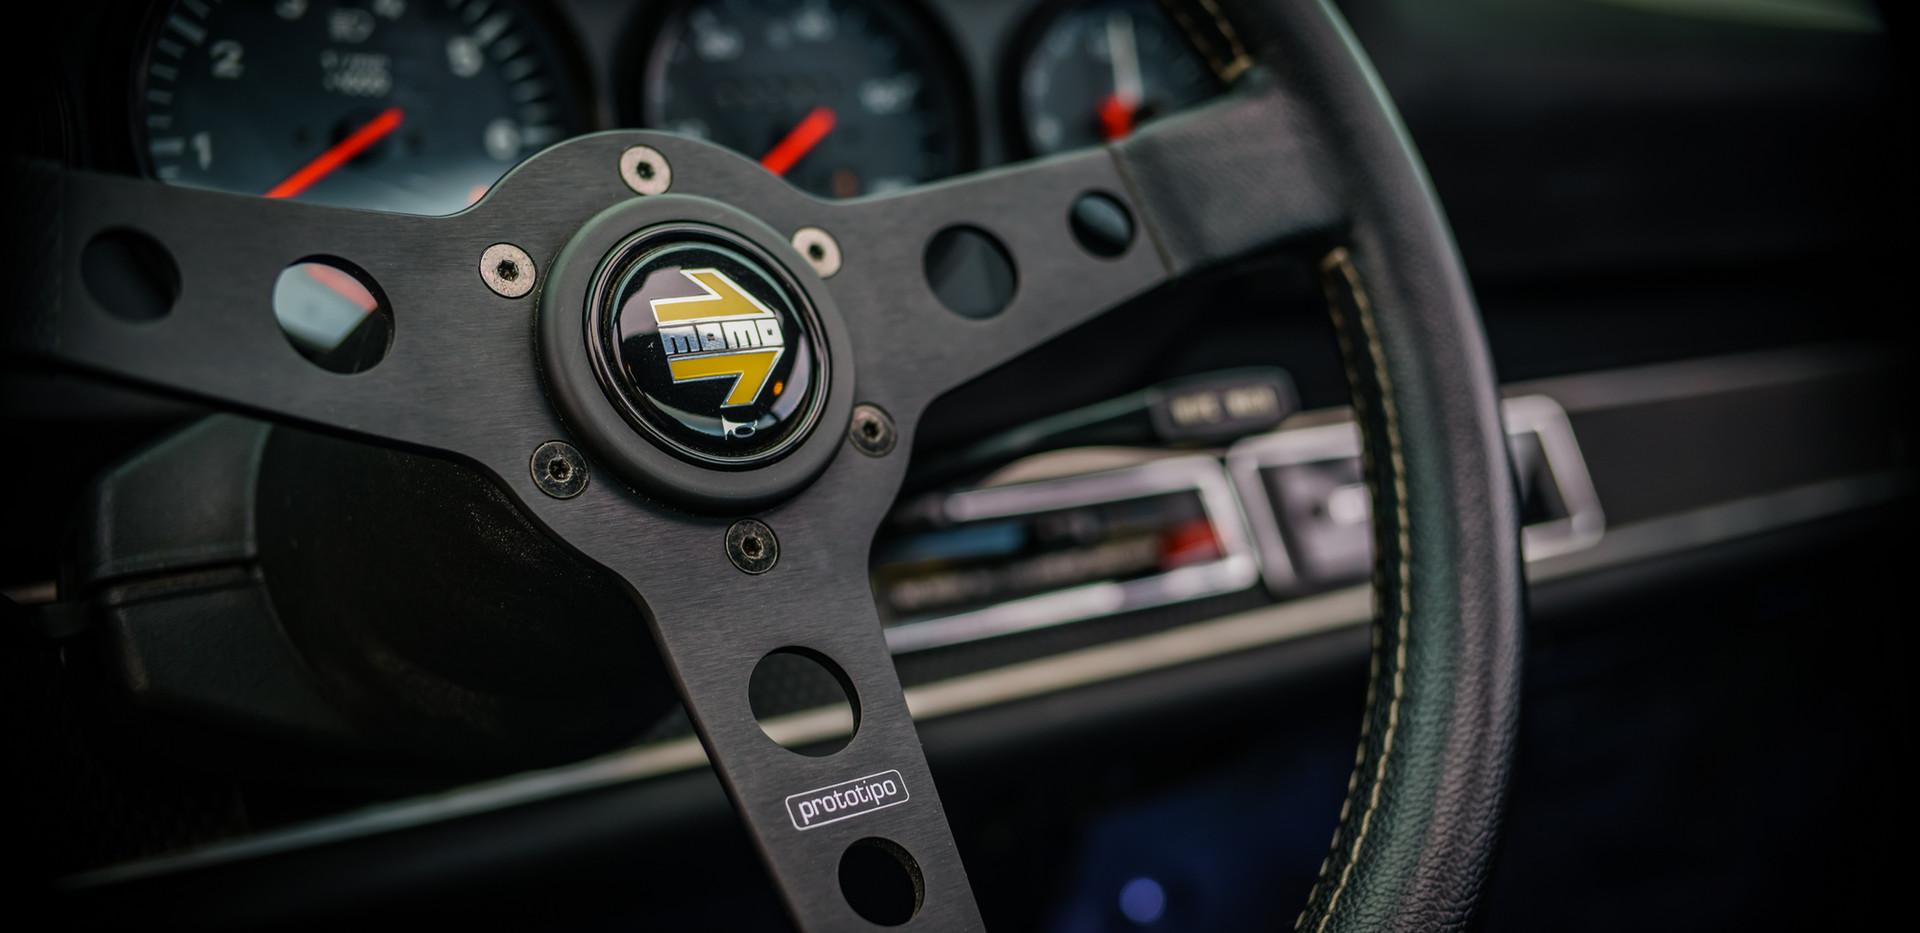 The Image Engine 1975 Porsche Turbo Hot-Rod